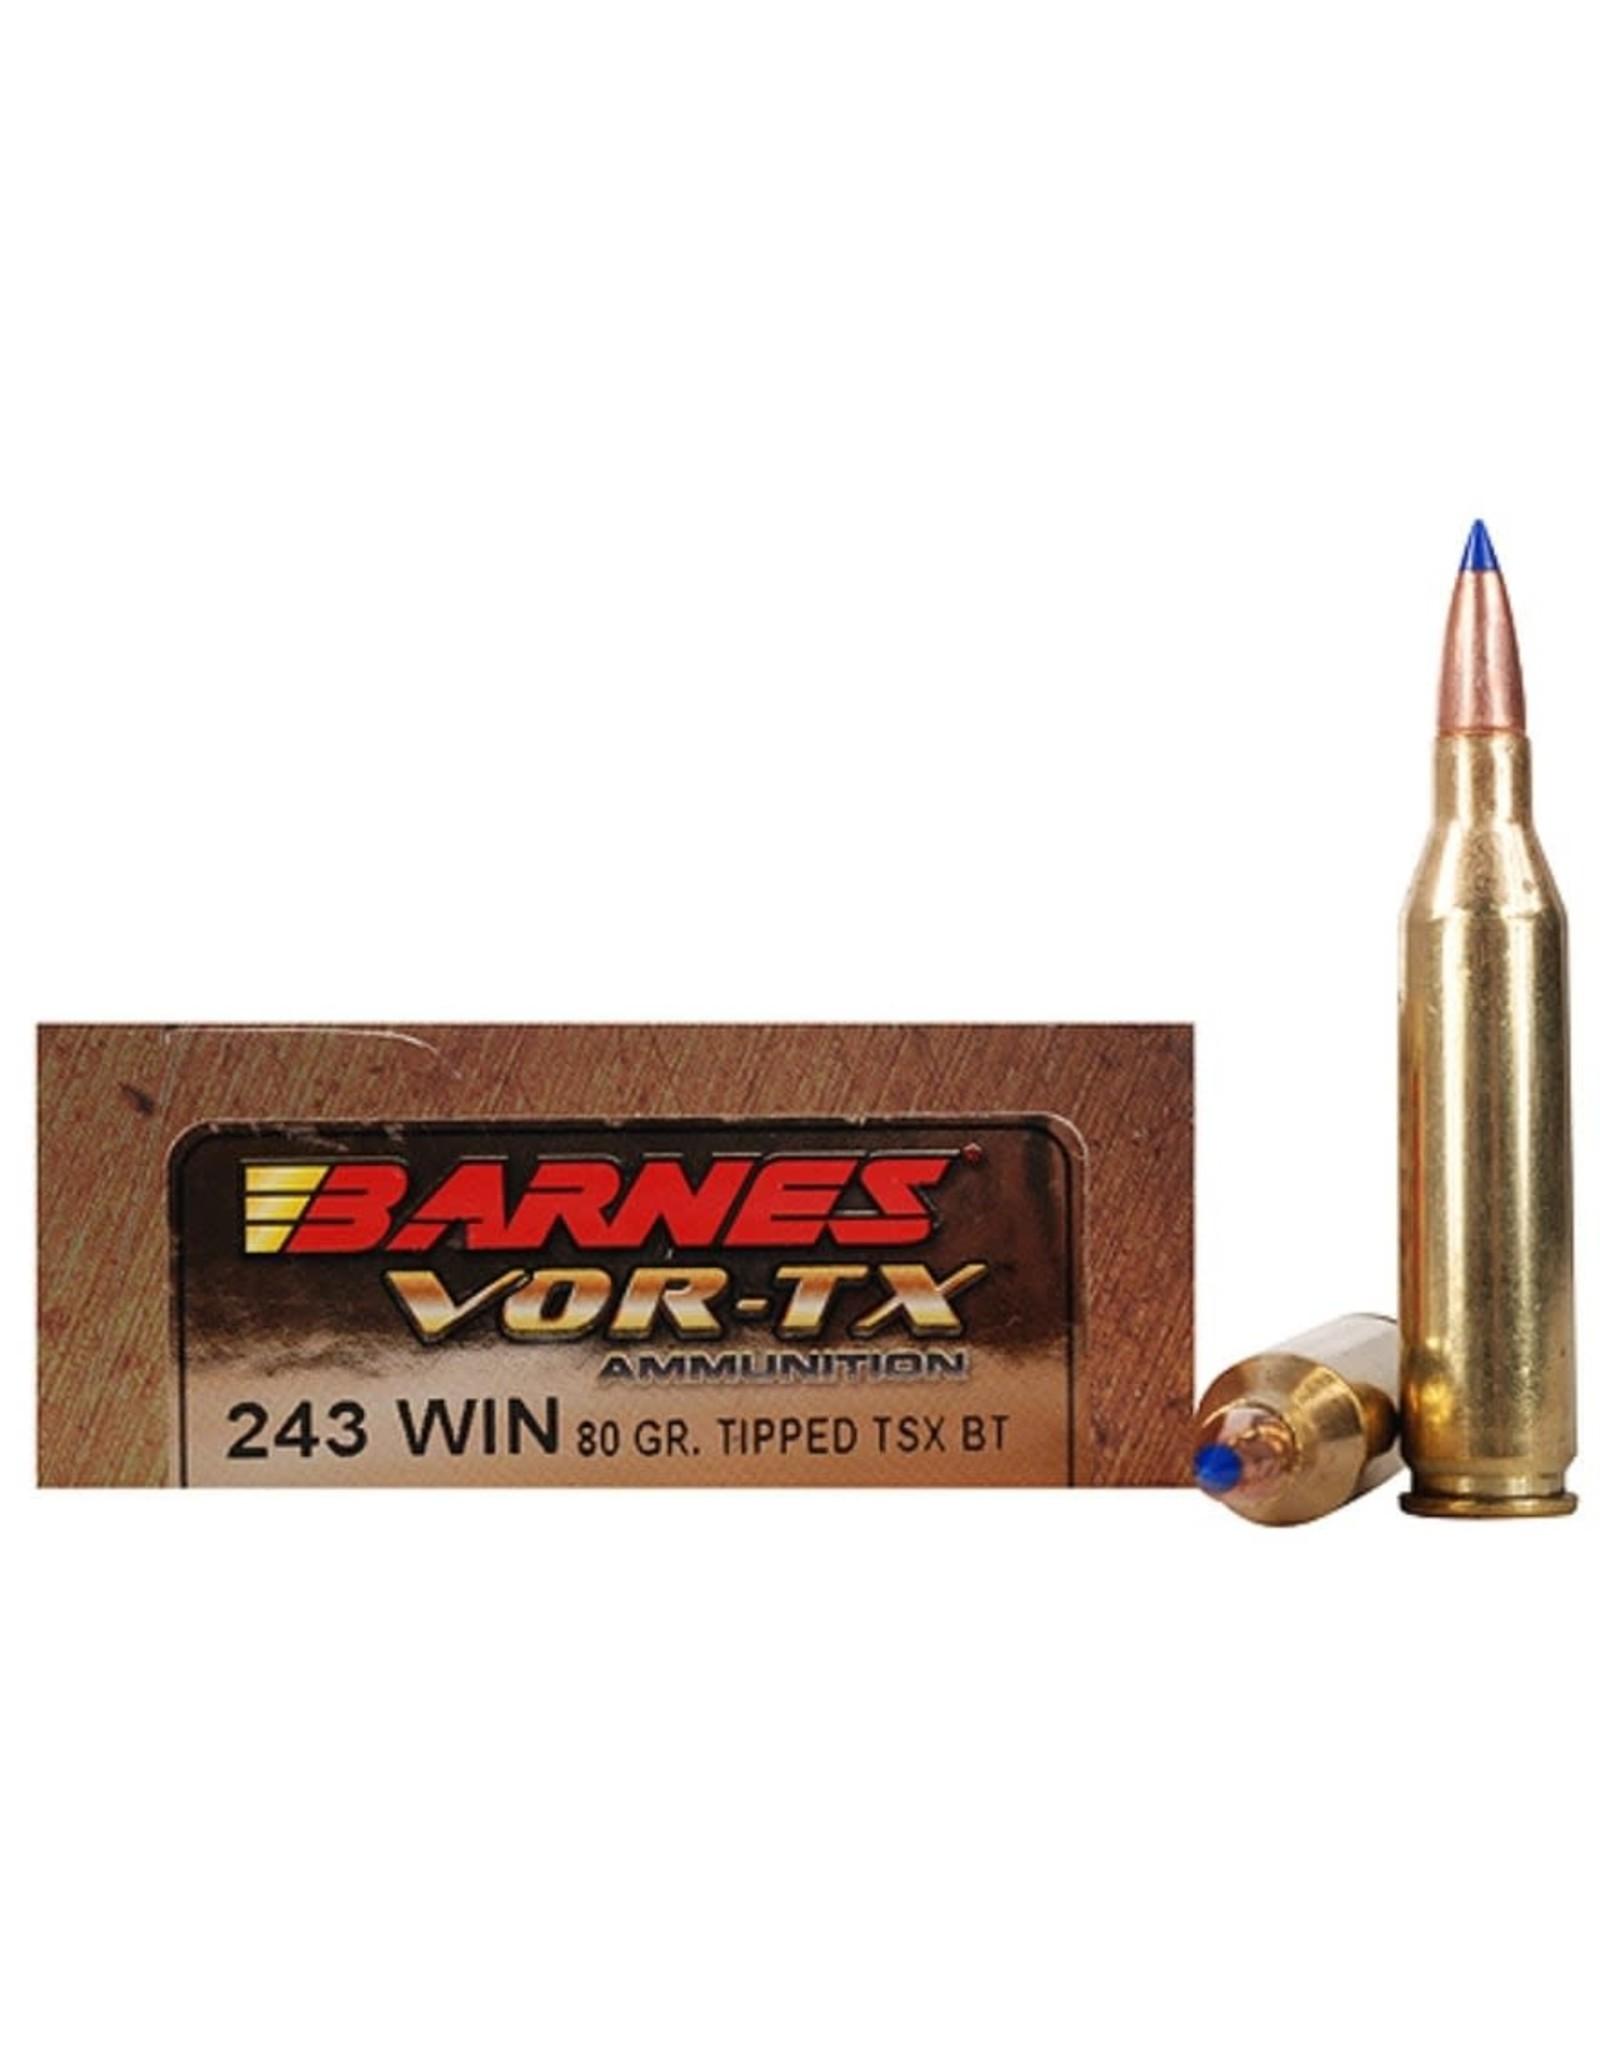 Barnes Barnes - 243 Win - 80gr Vor-Tx - 20ct